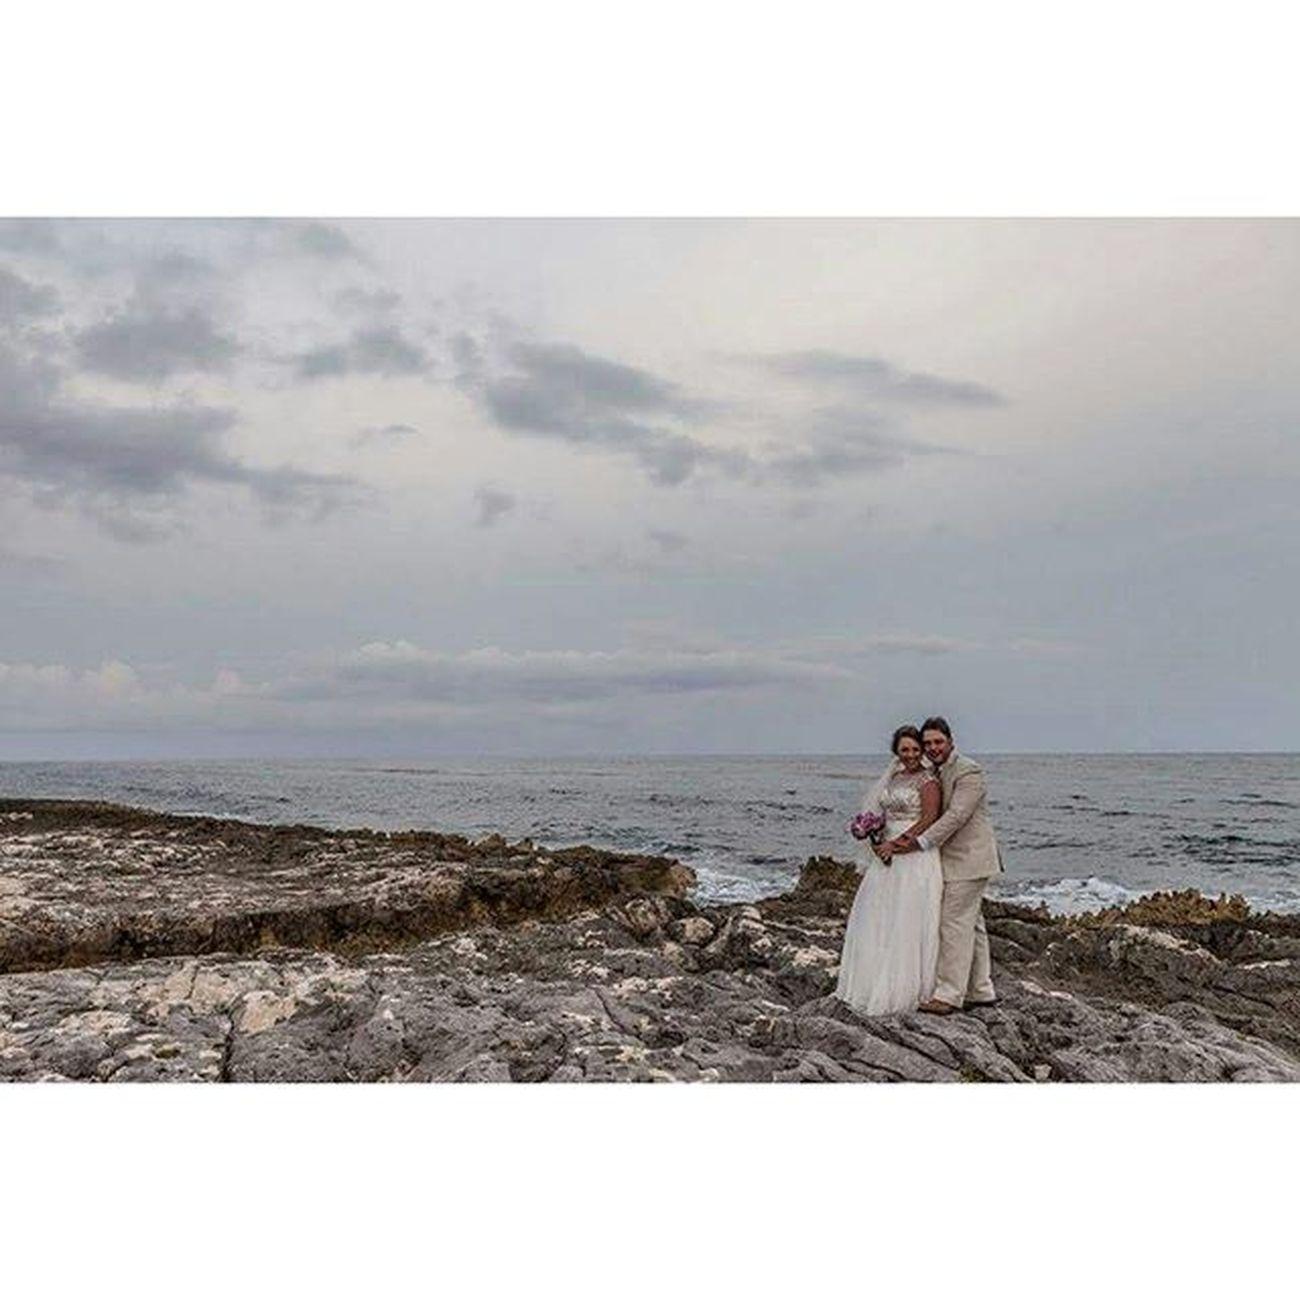 Canon 5dmarkll Mimexico Fotografo Foto Arte Bella Bonita Mar Weddingphotographer Wedding Weddingphotography Amor Love Rivieramaya